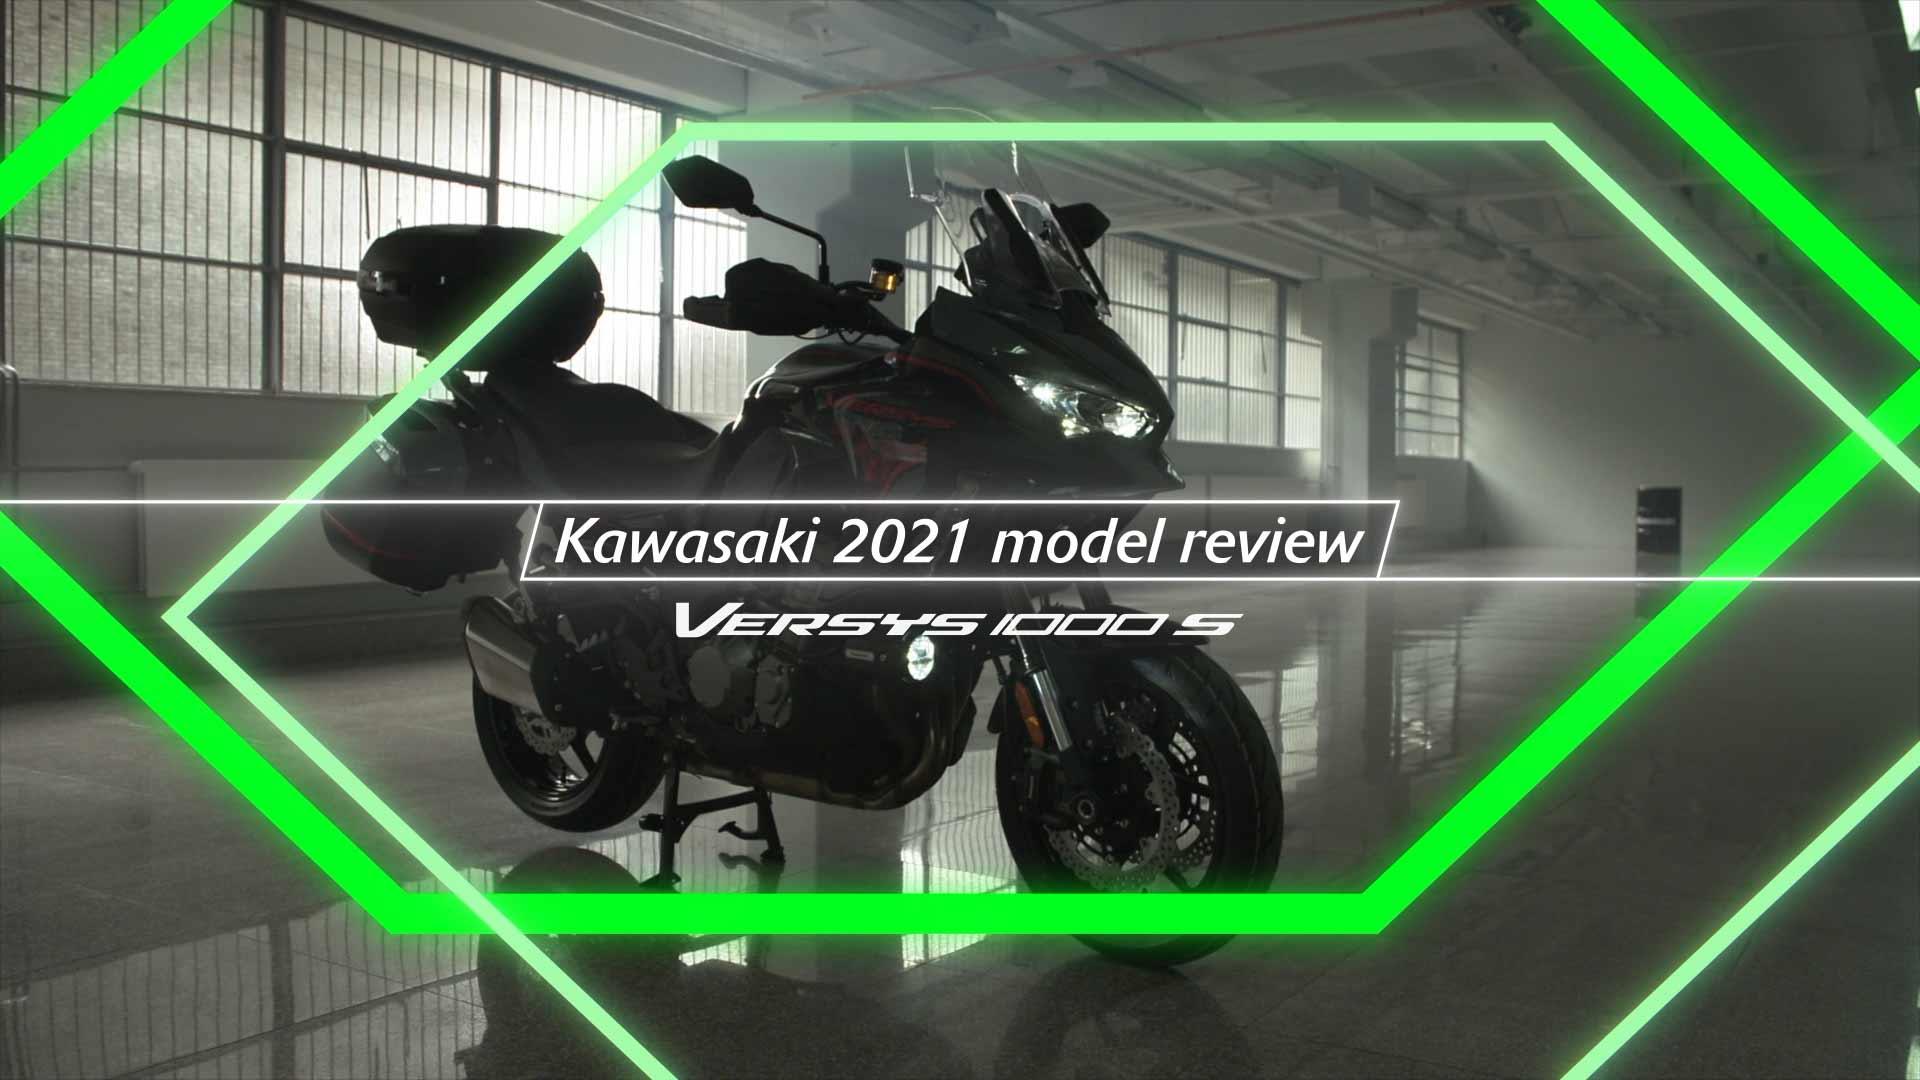 Kawasaki Reveal show